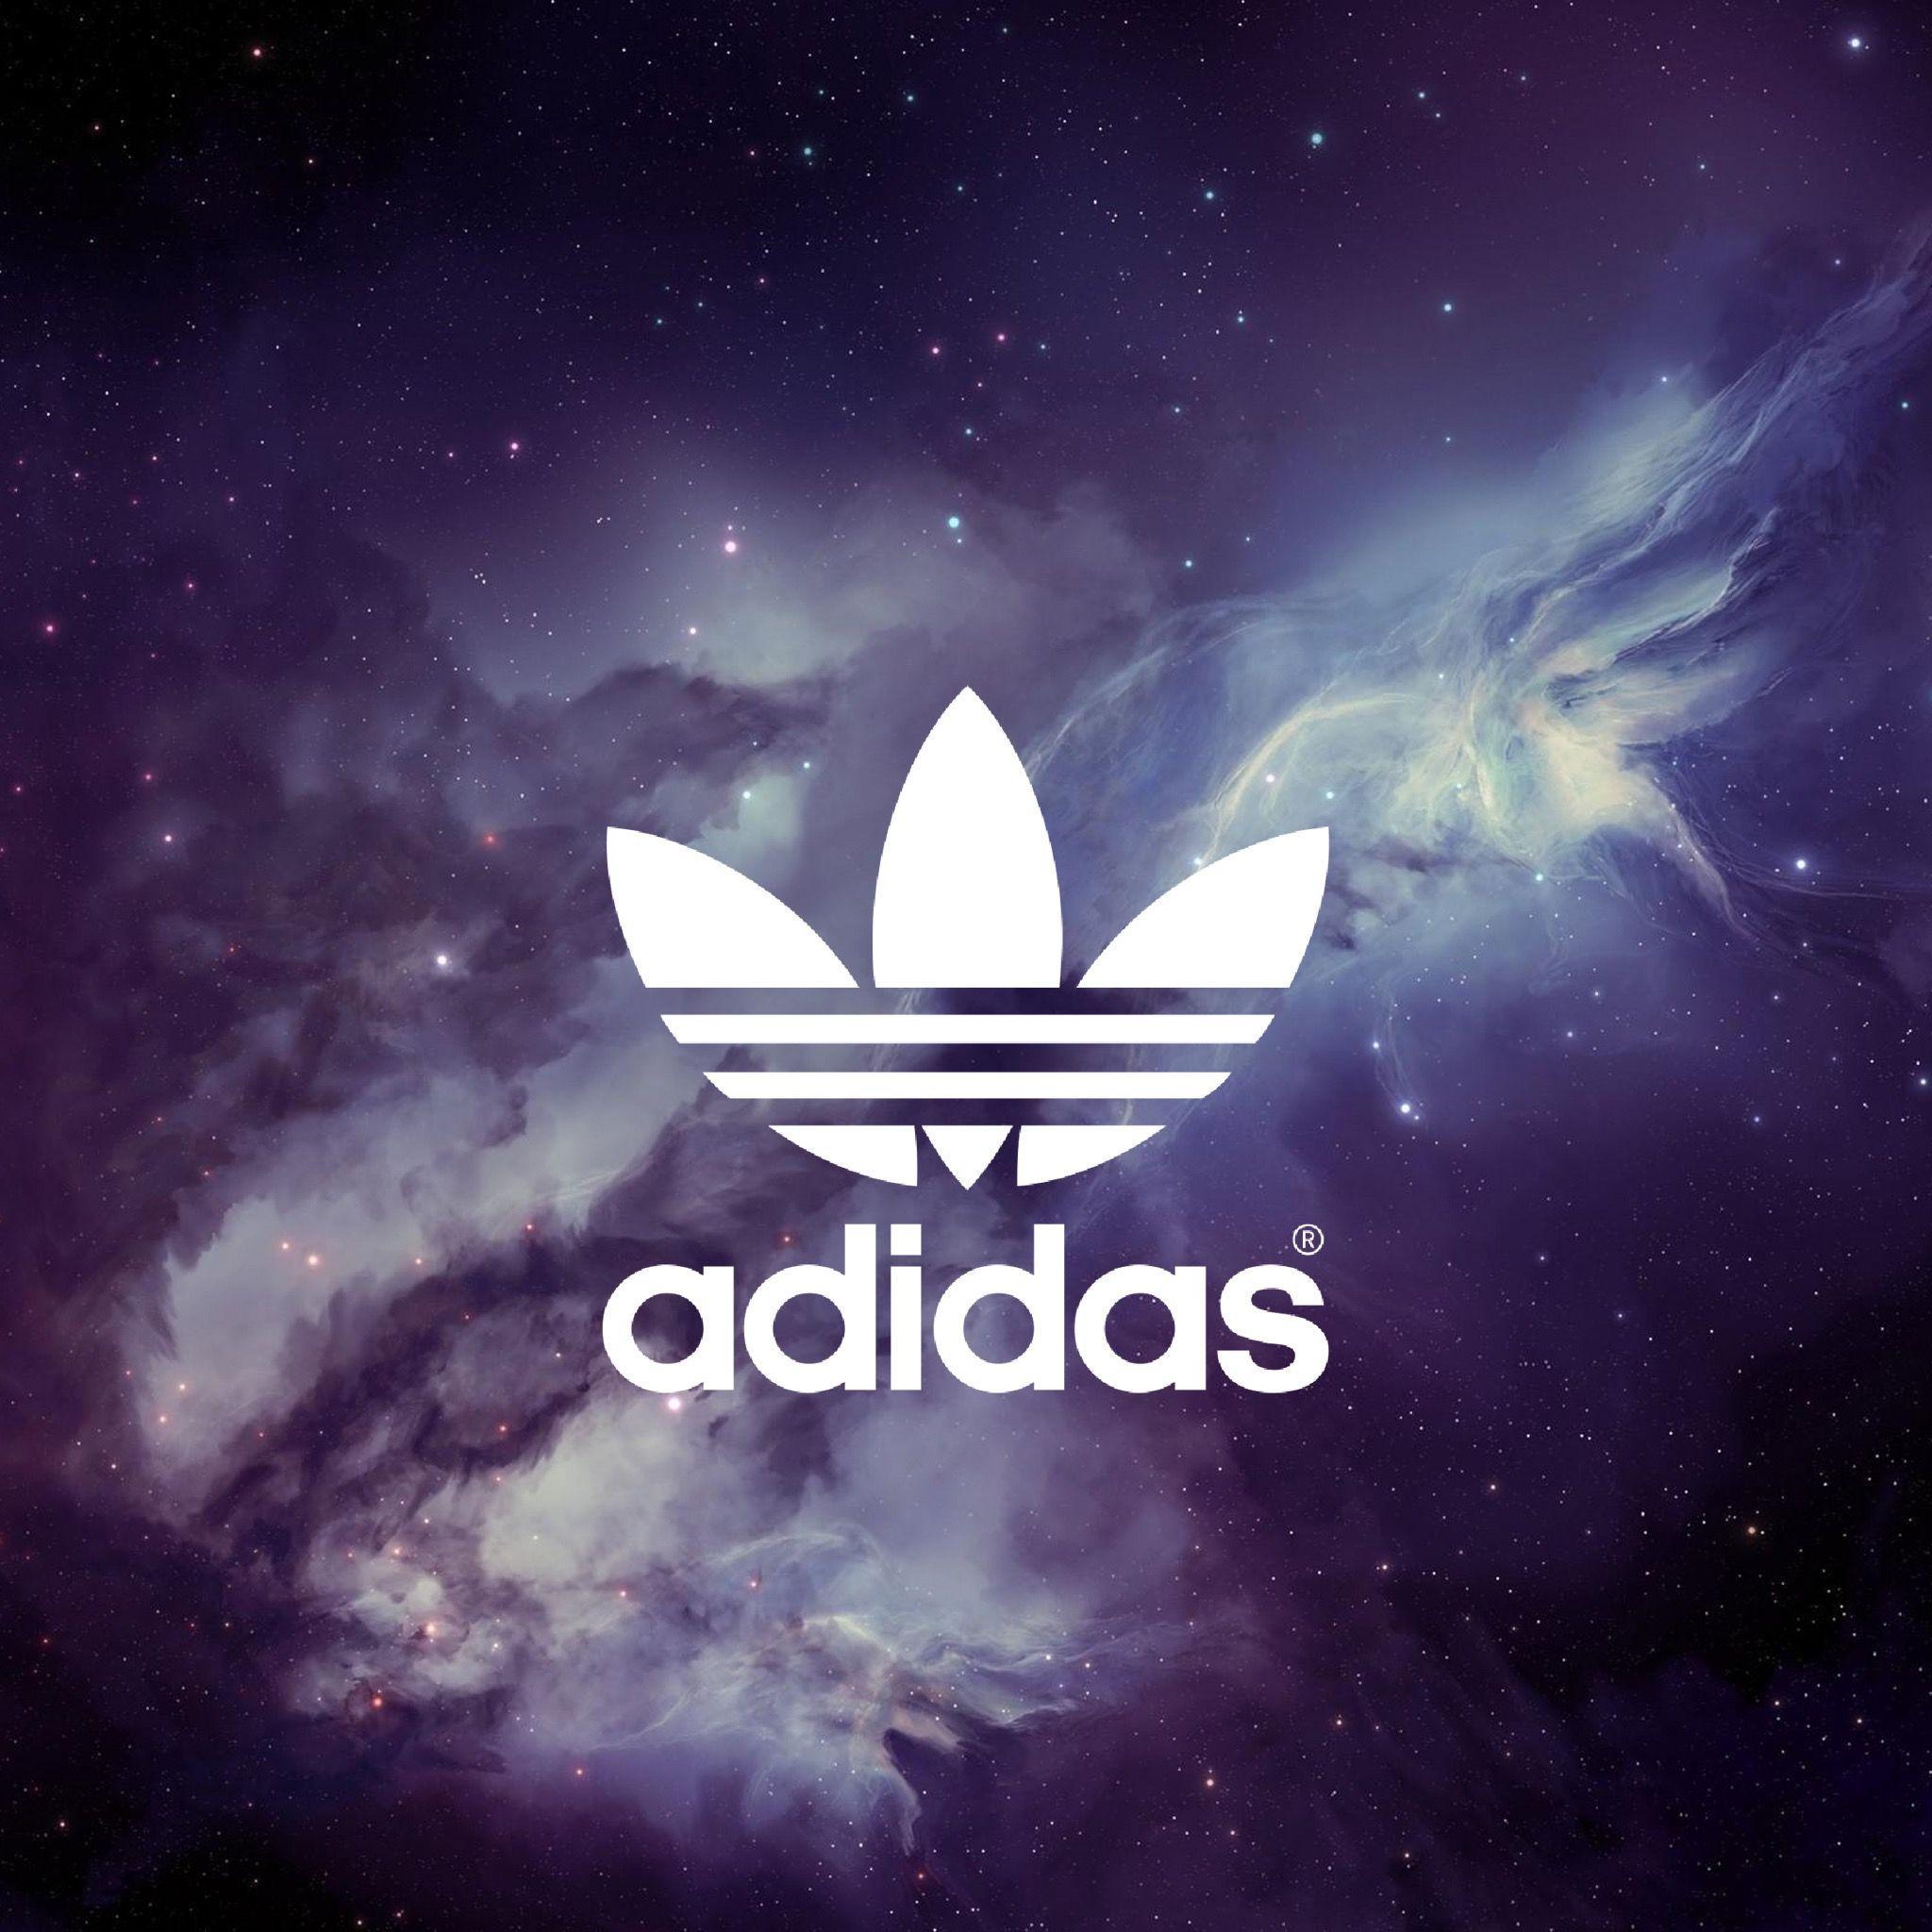 Adidas Galaxy Wallpapers Top Free Adidas Galaxy Backgrounds Wallpaperaccess